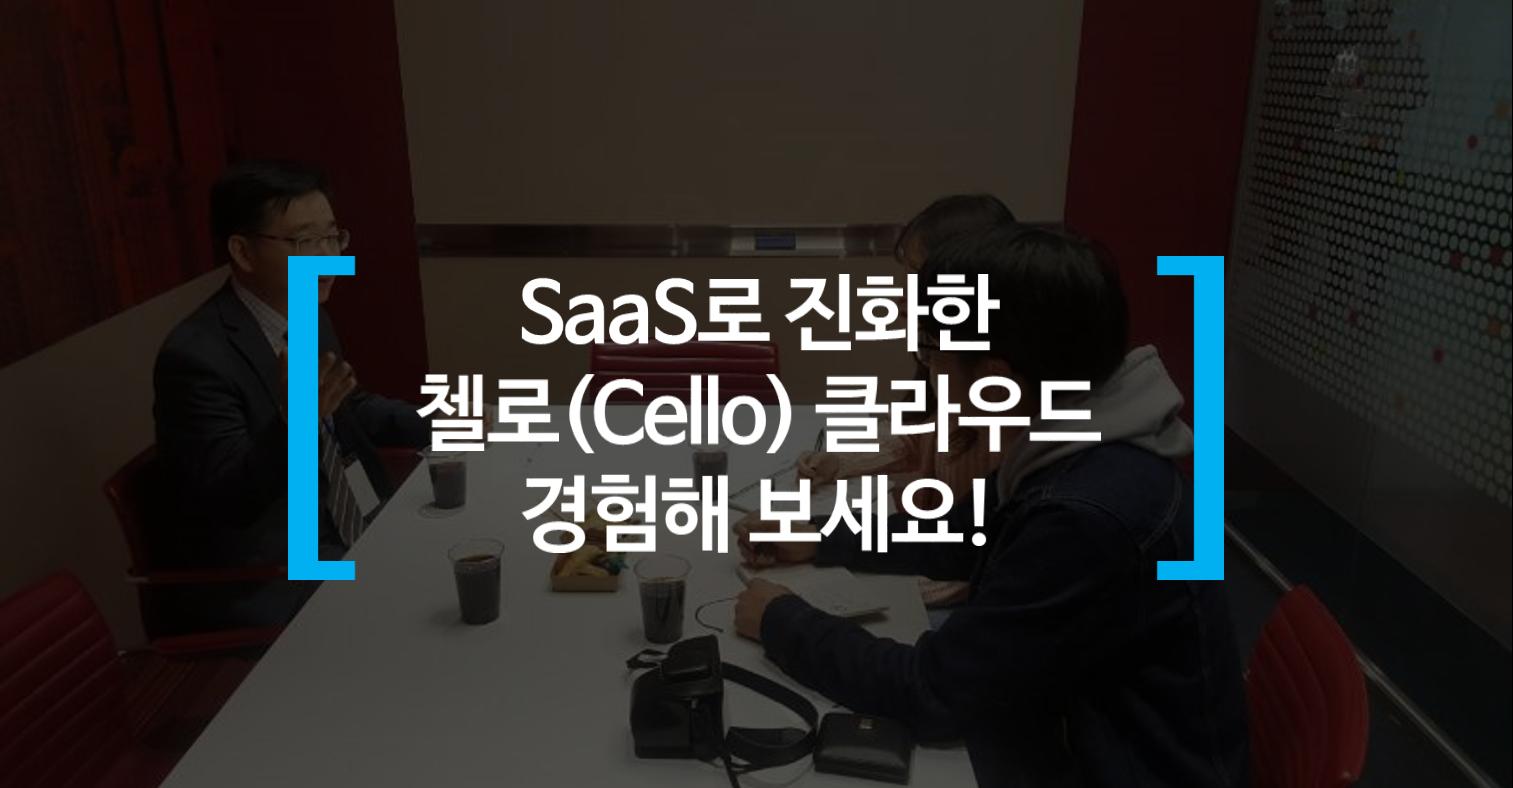 SaaS로 진화한 첼로(Cello) 클라우드 경험해 보세요!